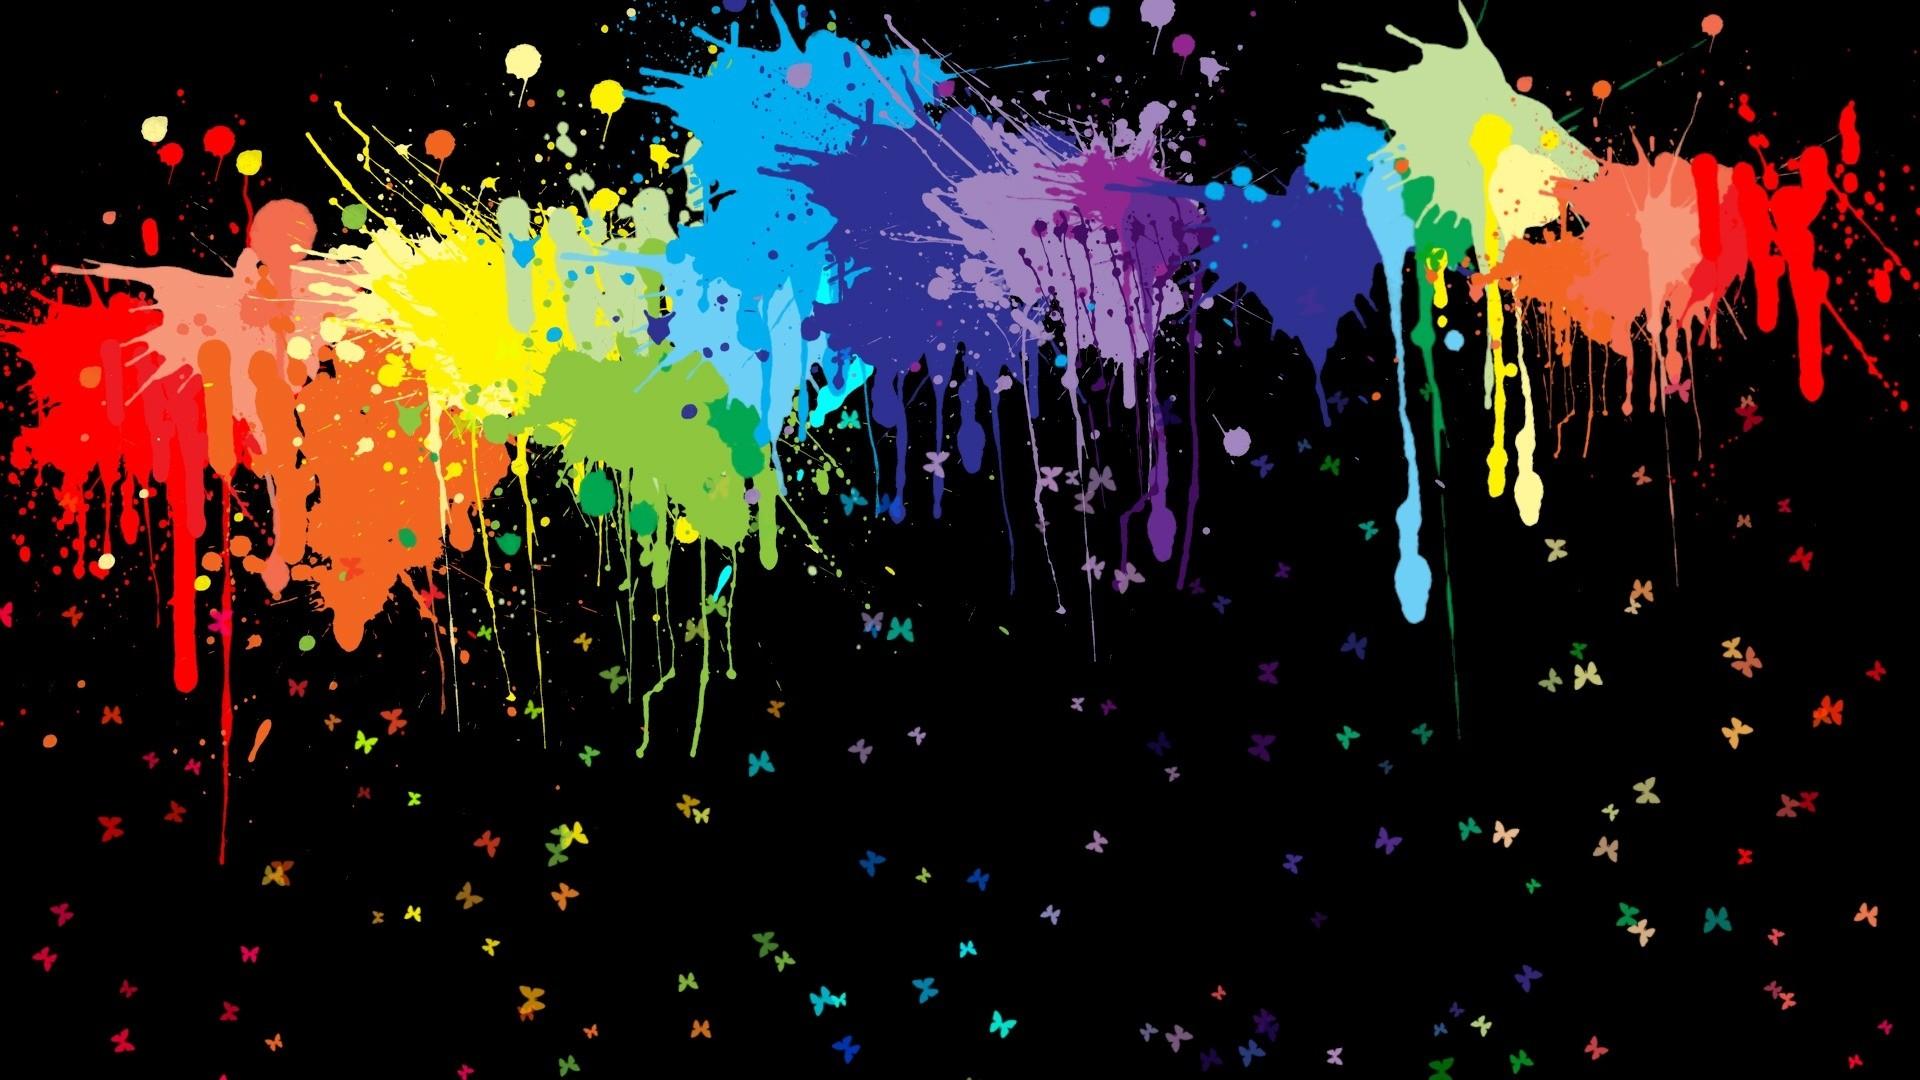 Paint Splash wallpaper